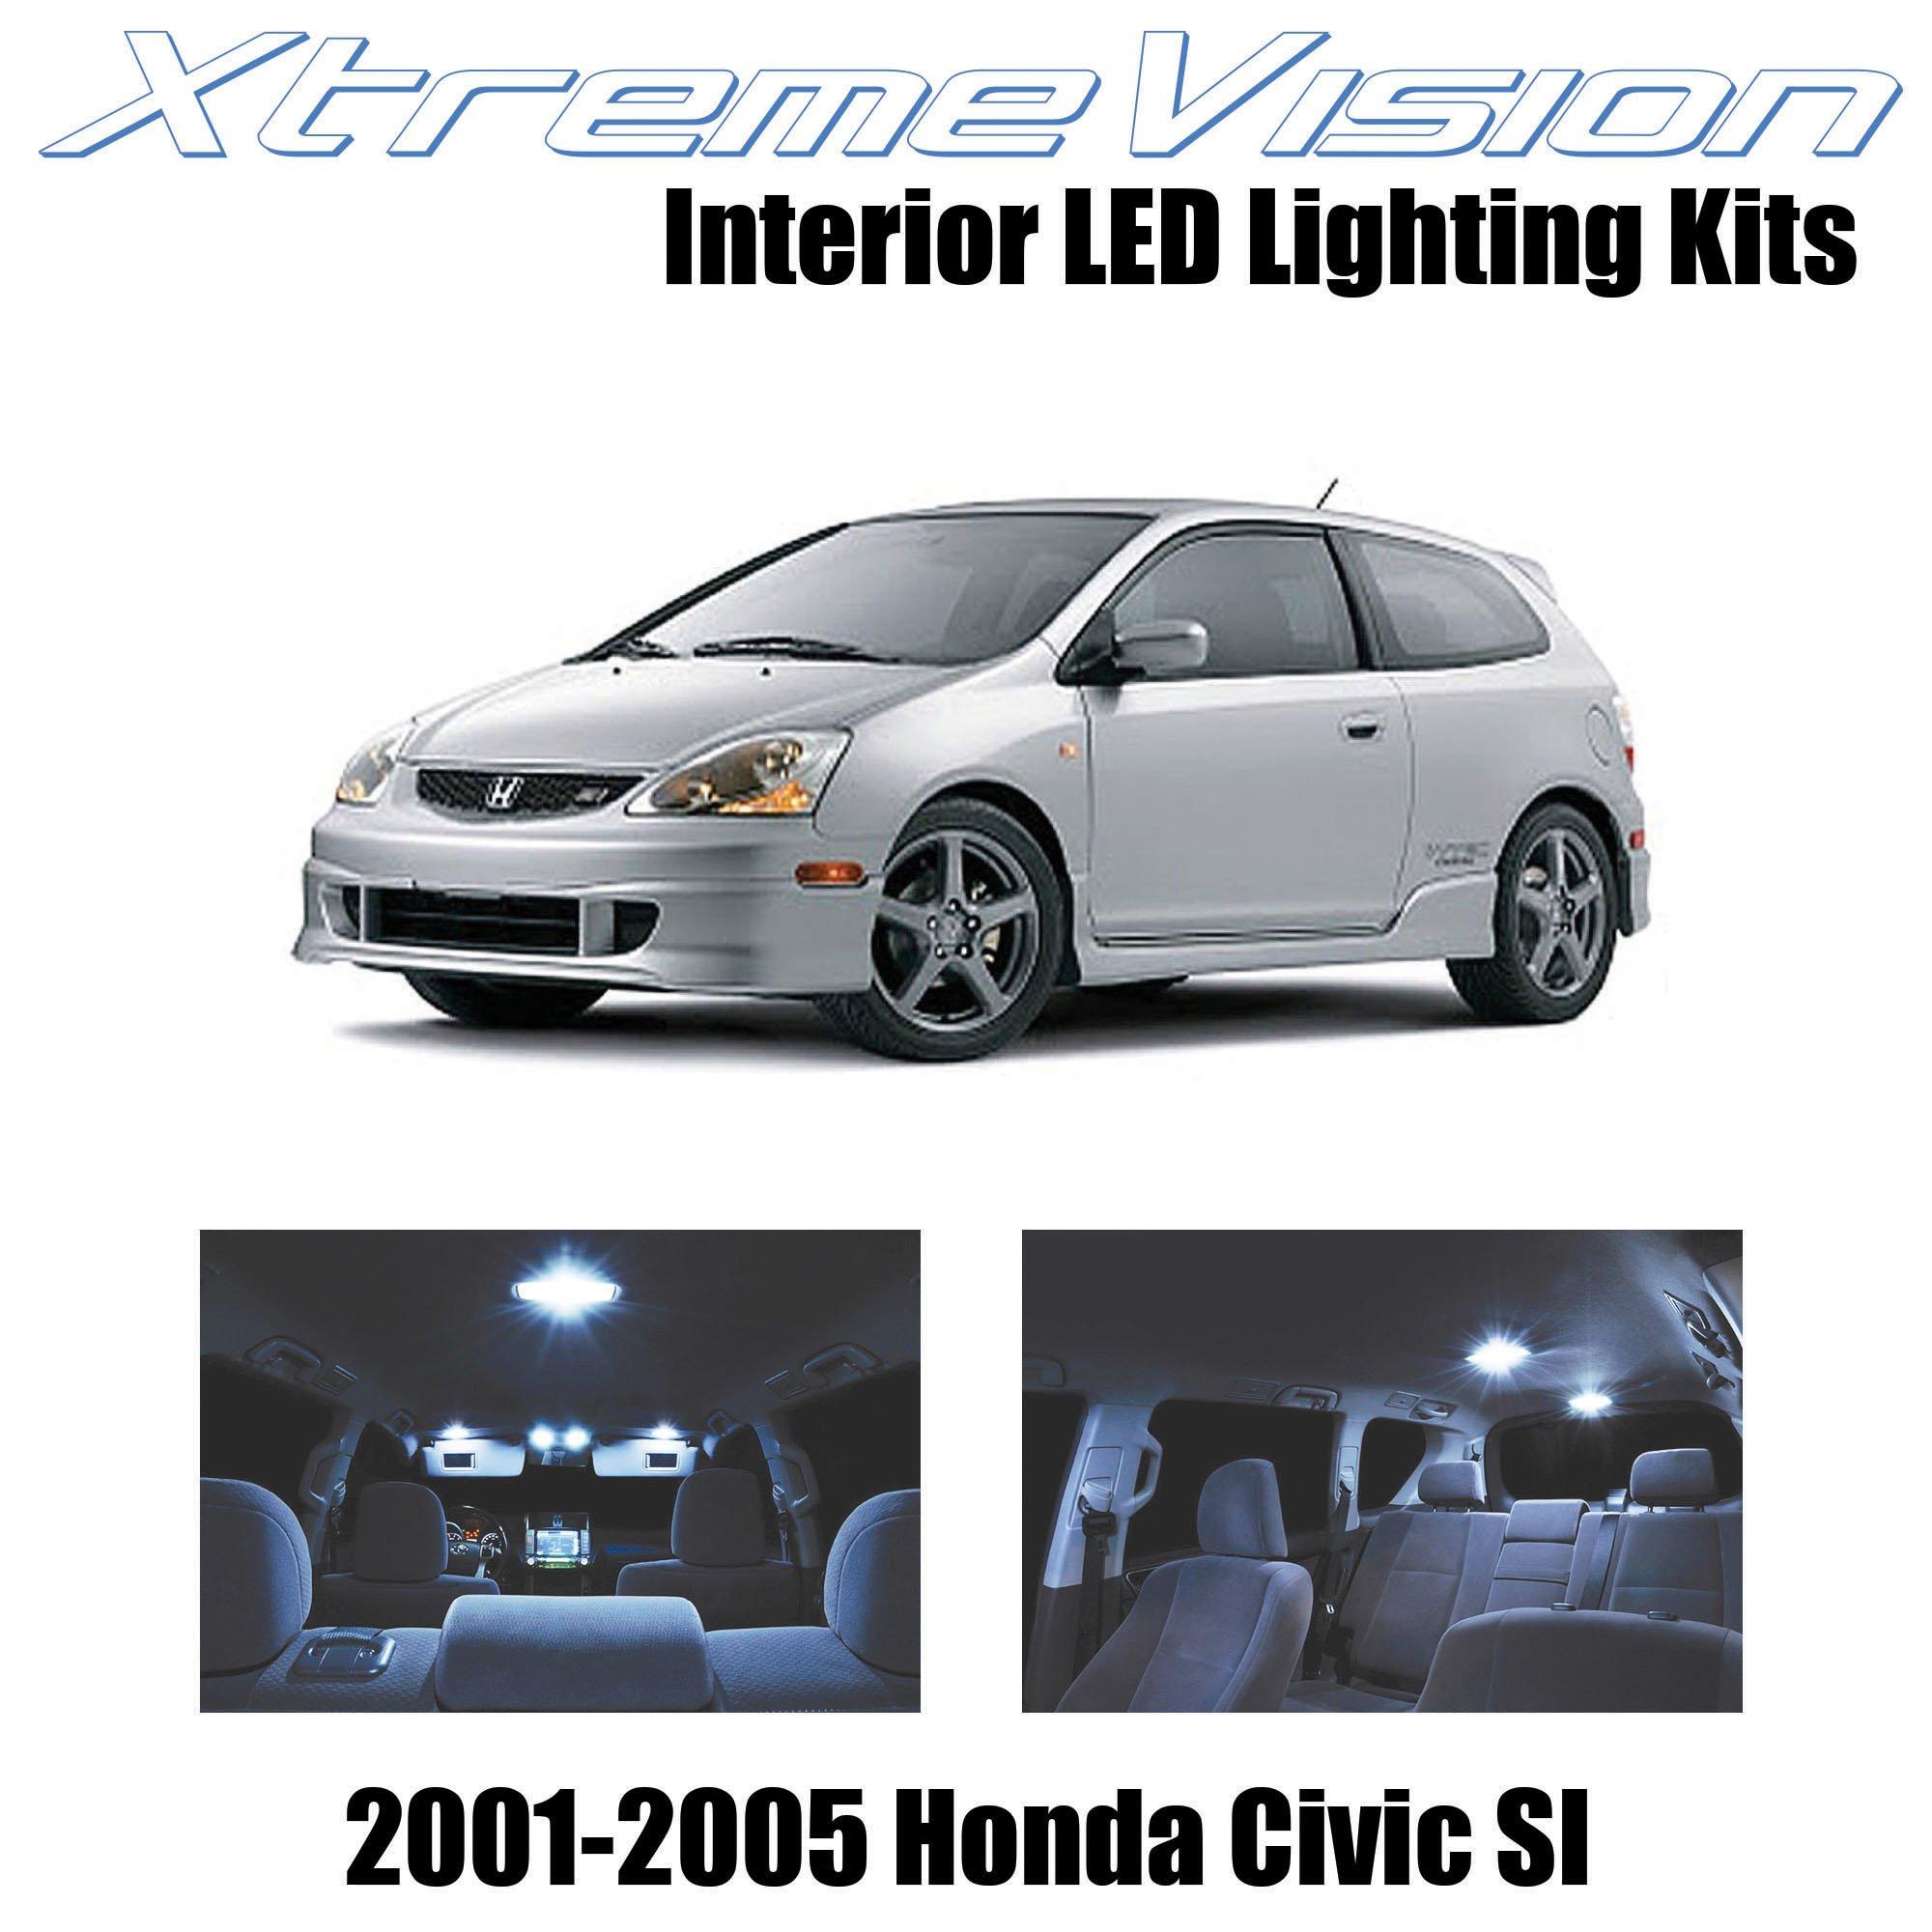 USARemote Car Key Fob Keyless Entry Remote fits 2002-2004 Honda CR-V 2005-2011 Element OUCG8D-344H-A 2002-2005 Civic Si